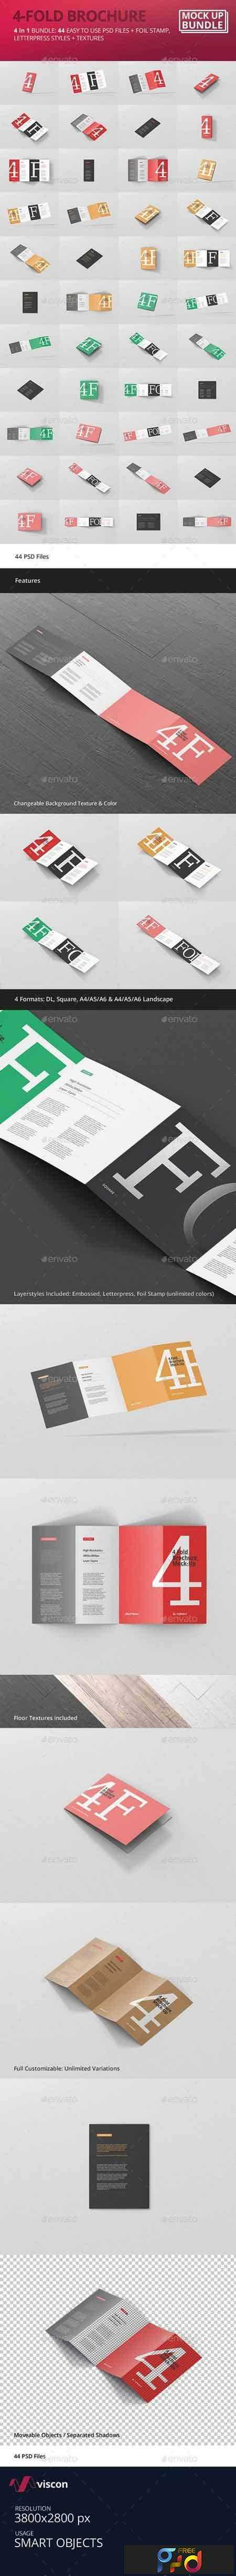 1709203 4-Fold Brochure Mockup Bundle 20411533 1